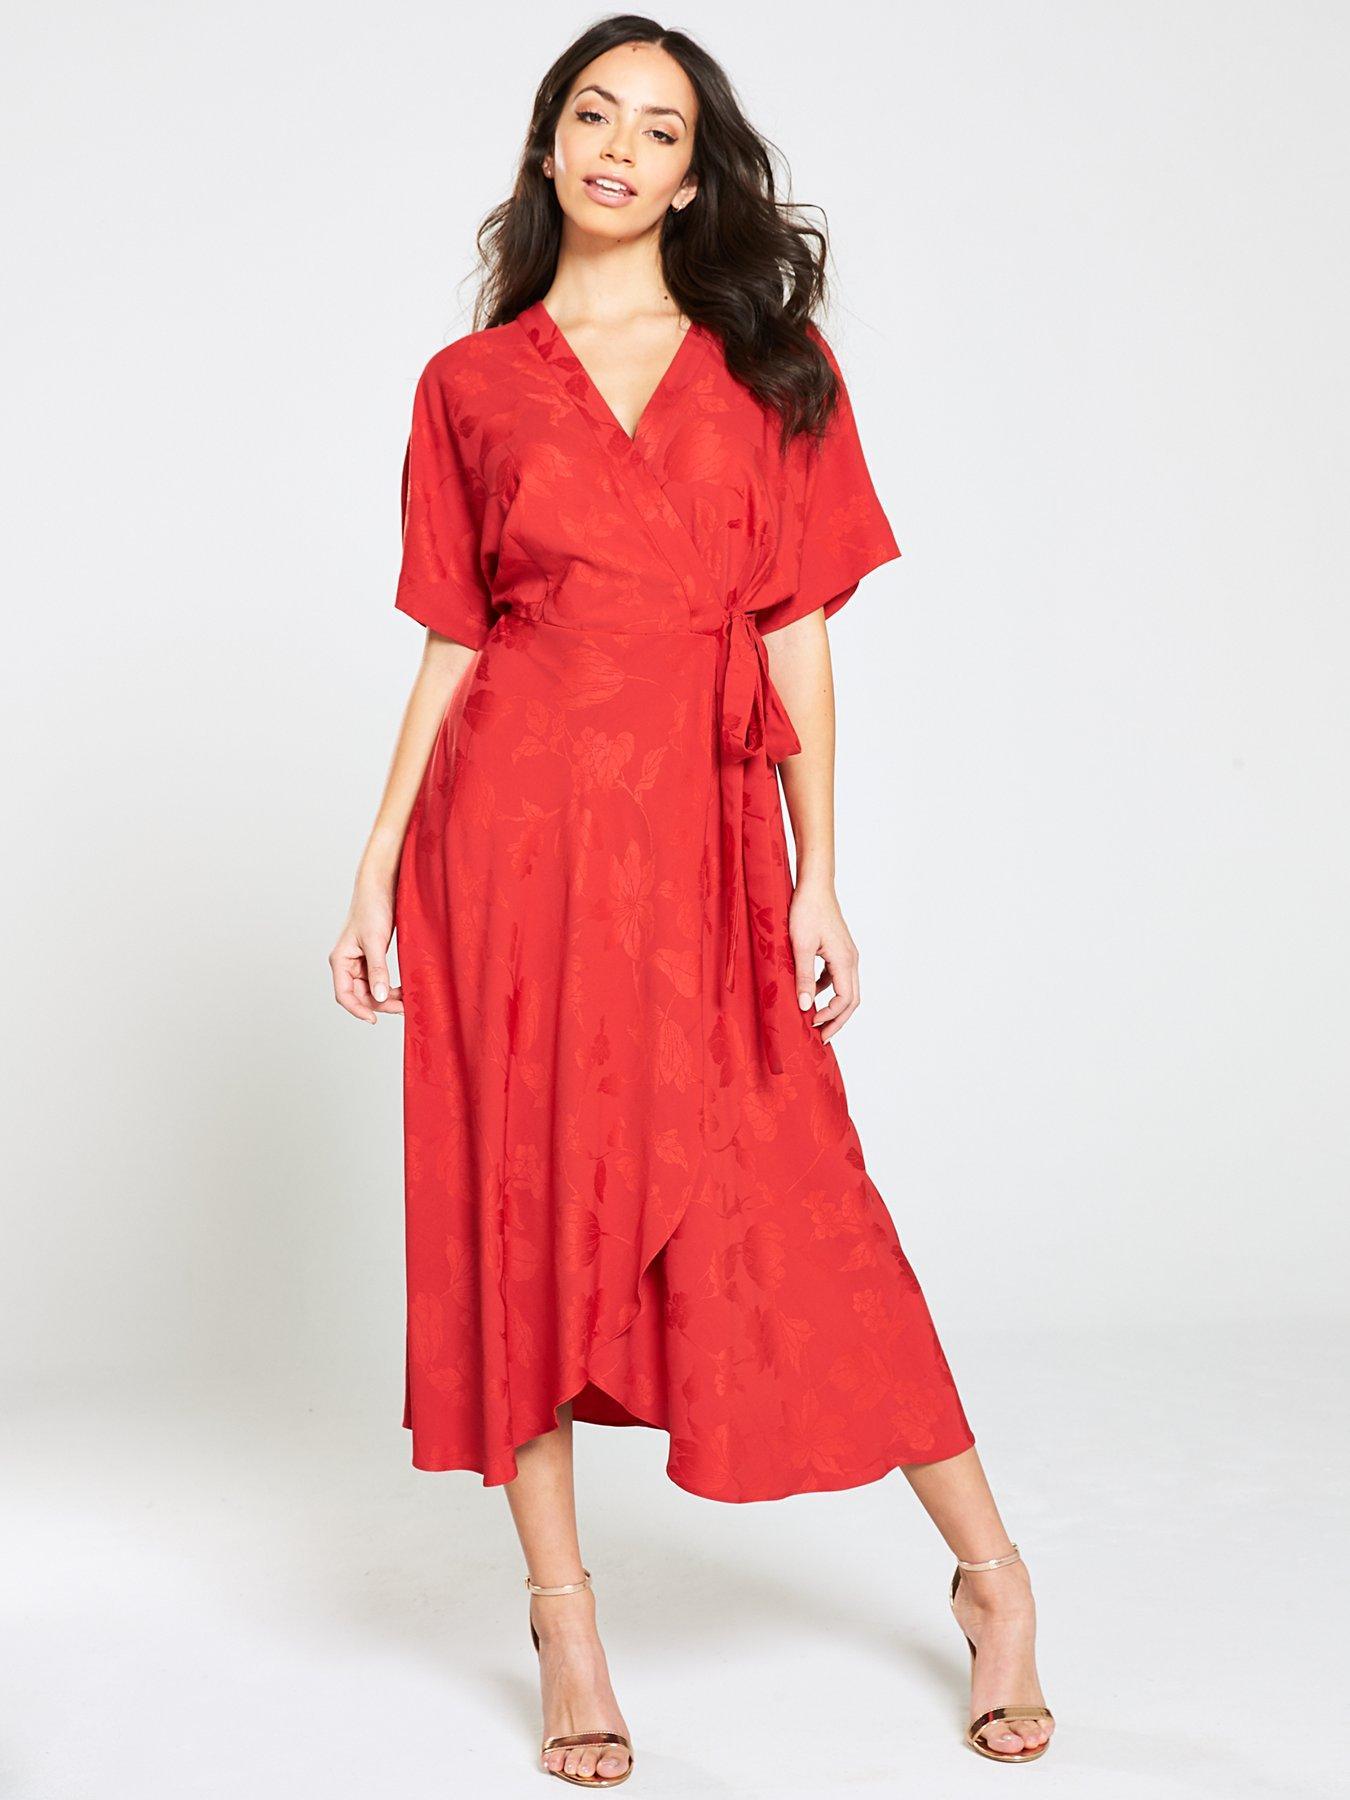 Cheap Party Dresses UK